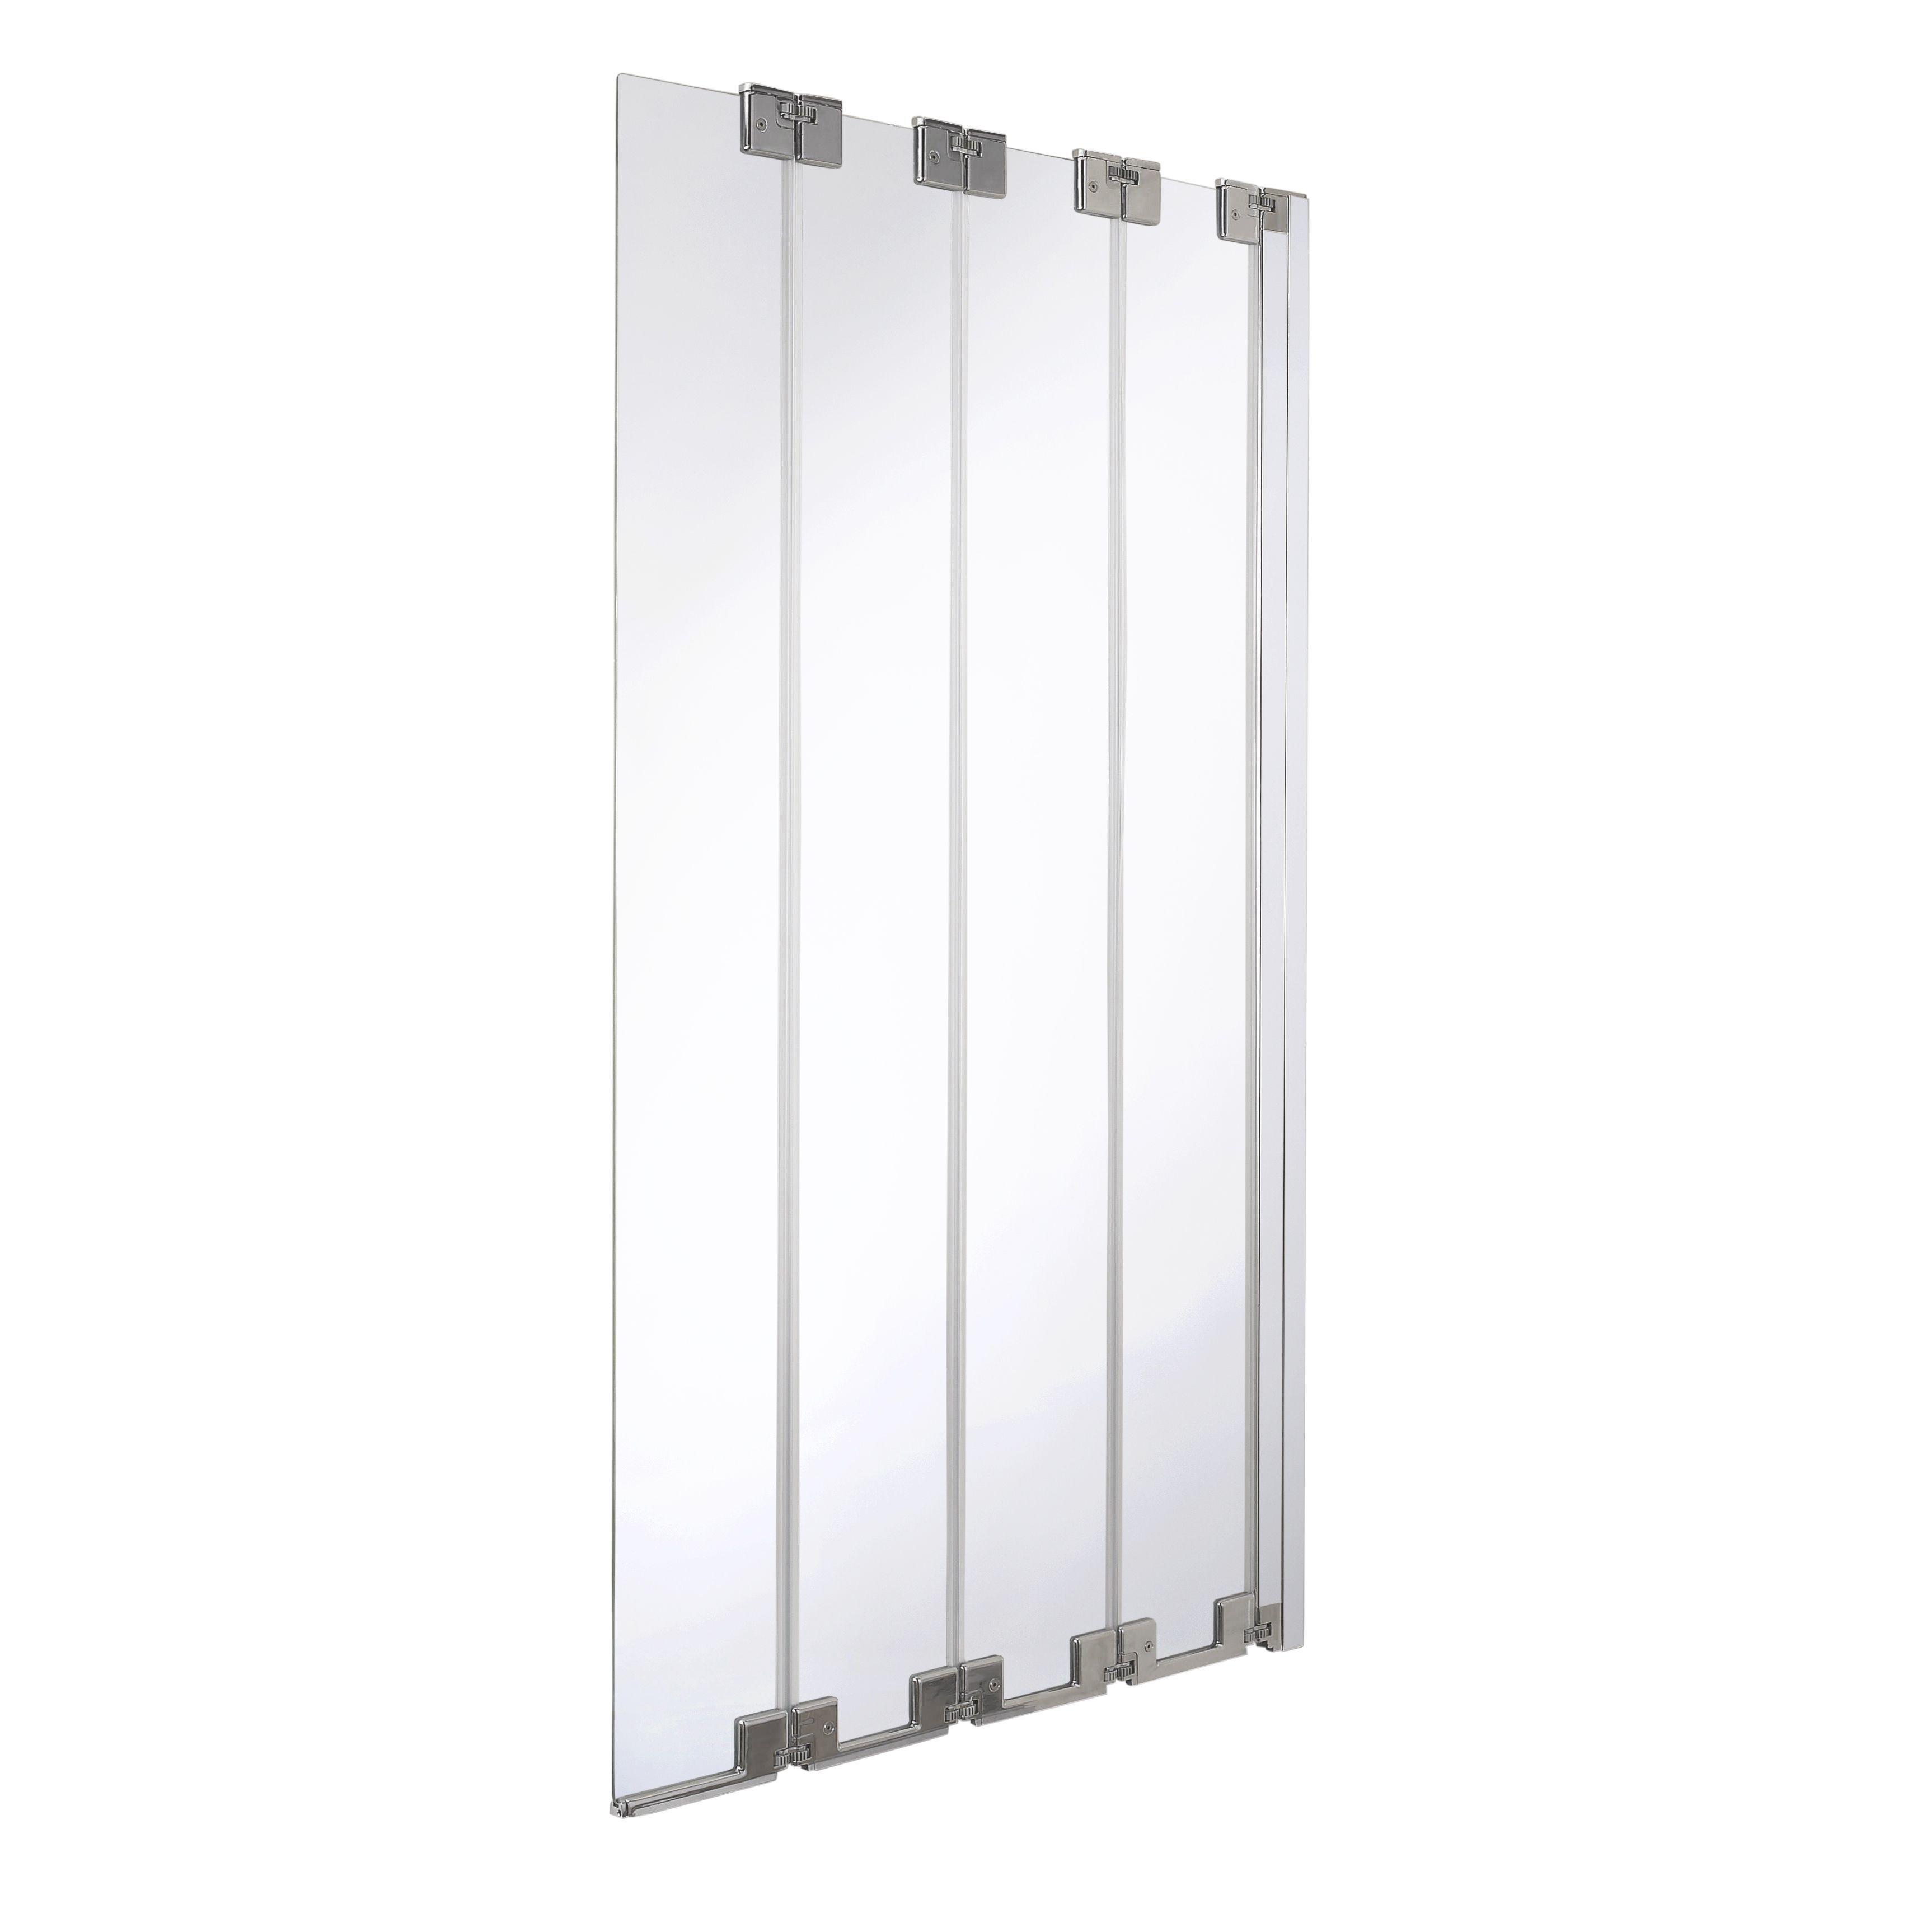 Cooke U0026 Lewis Seine Straight 4 Panel Frameless Folding Bath Screen (w)850mm